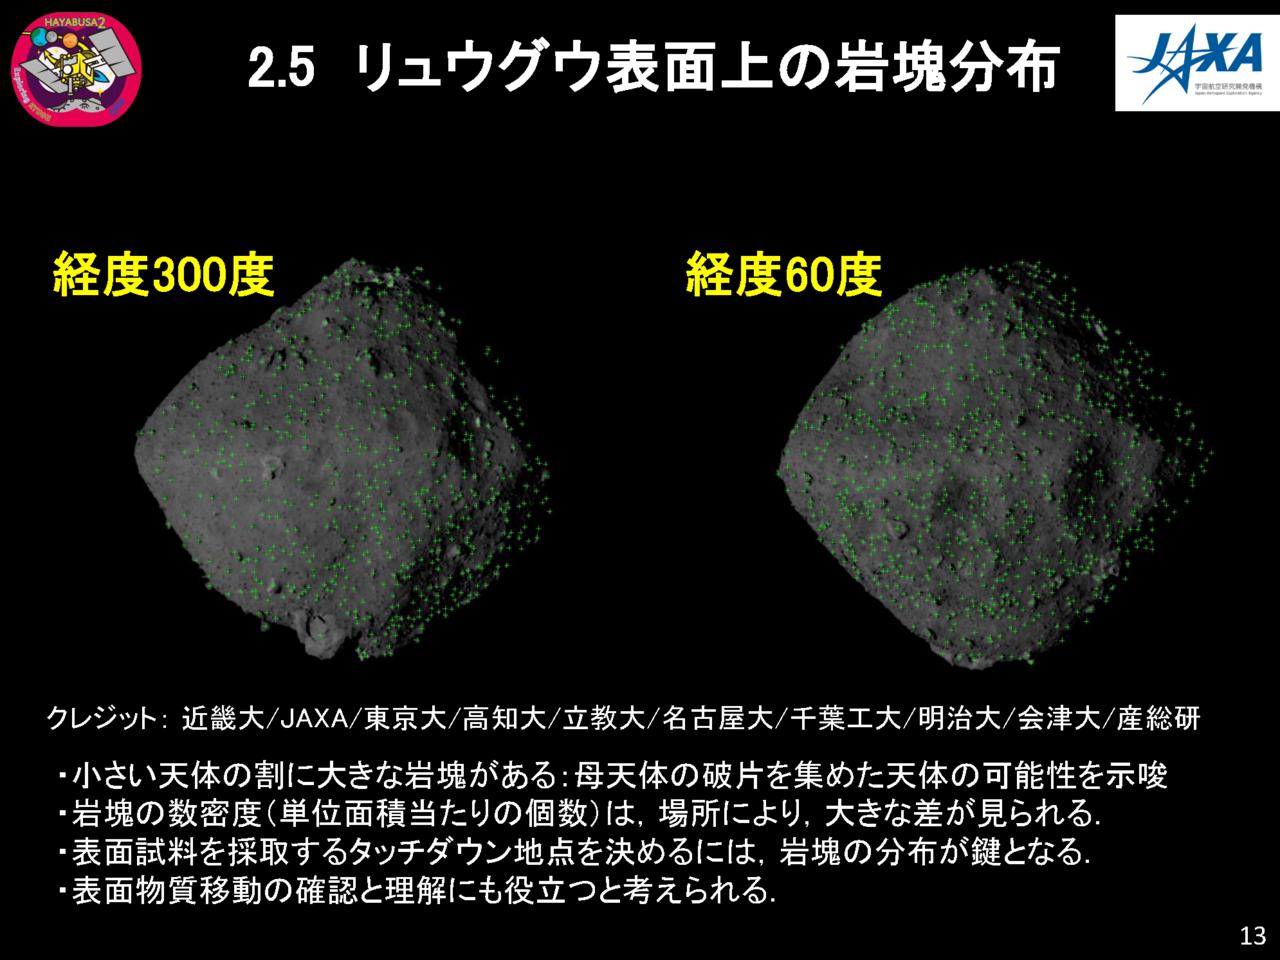 f:id:Imamura:20180719131708p:plain